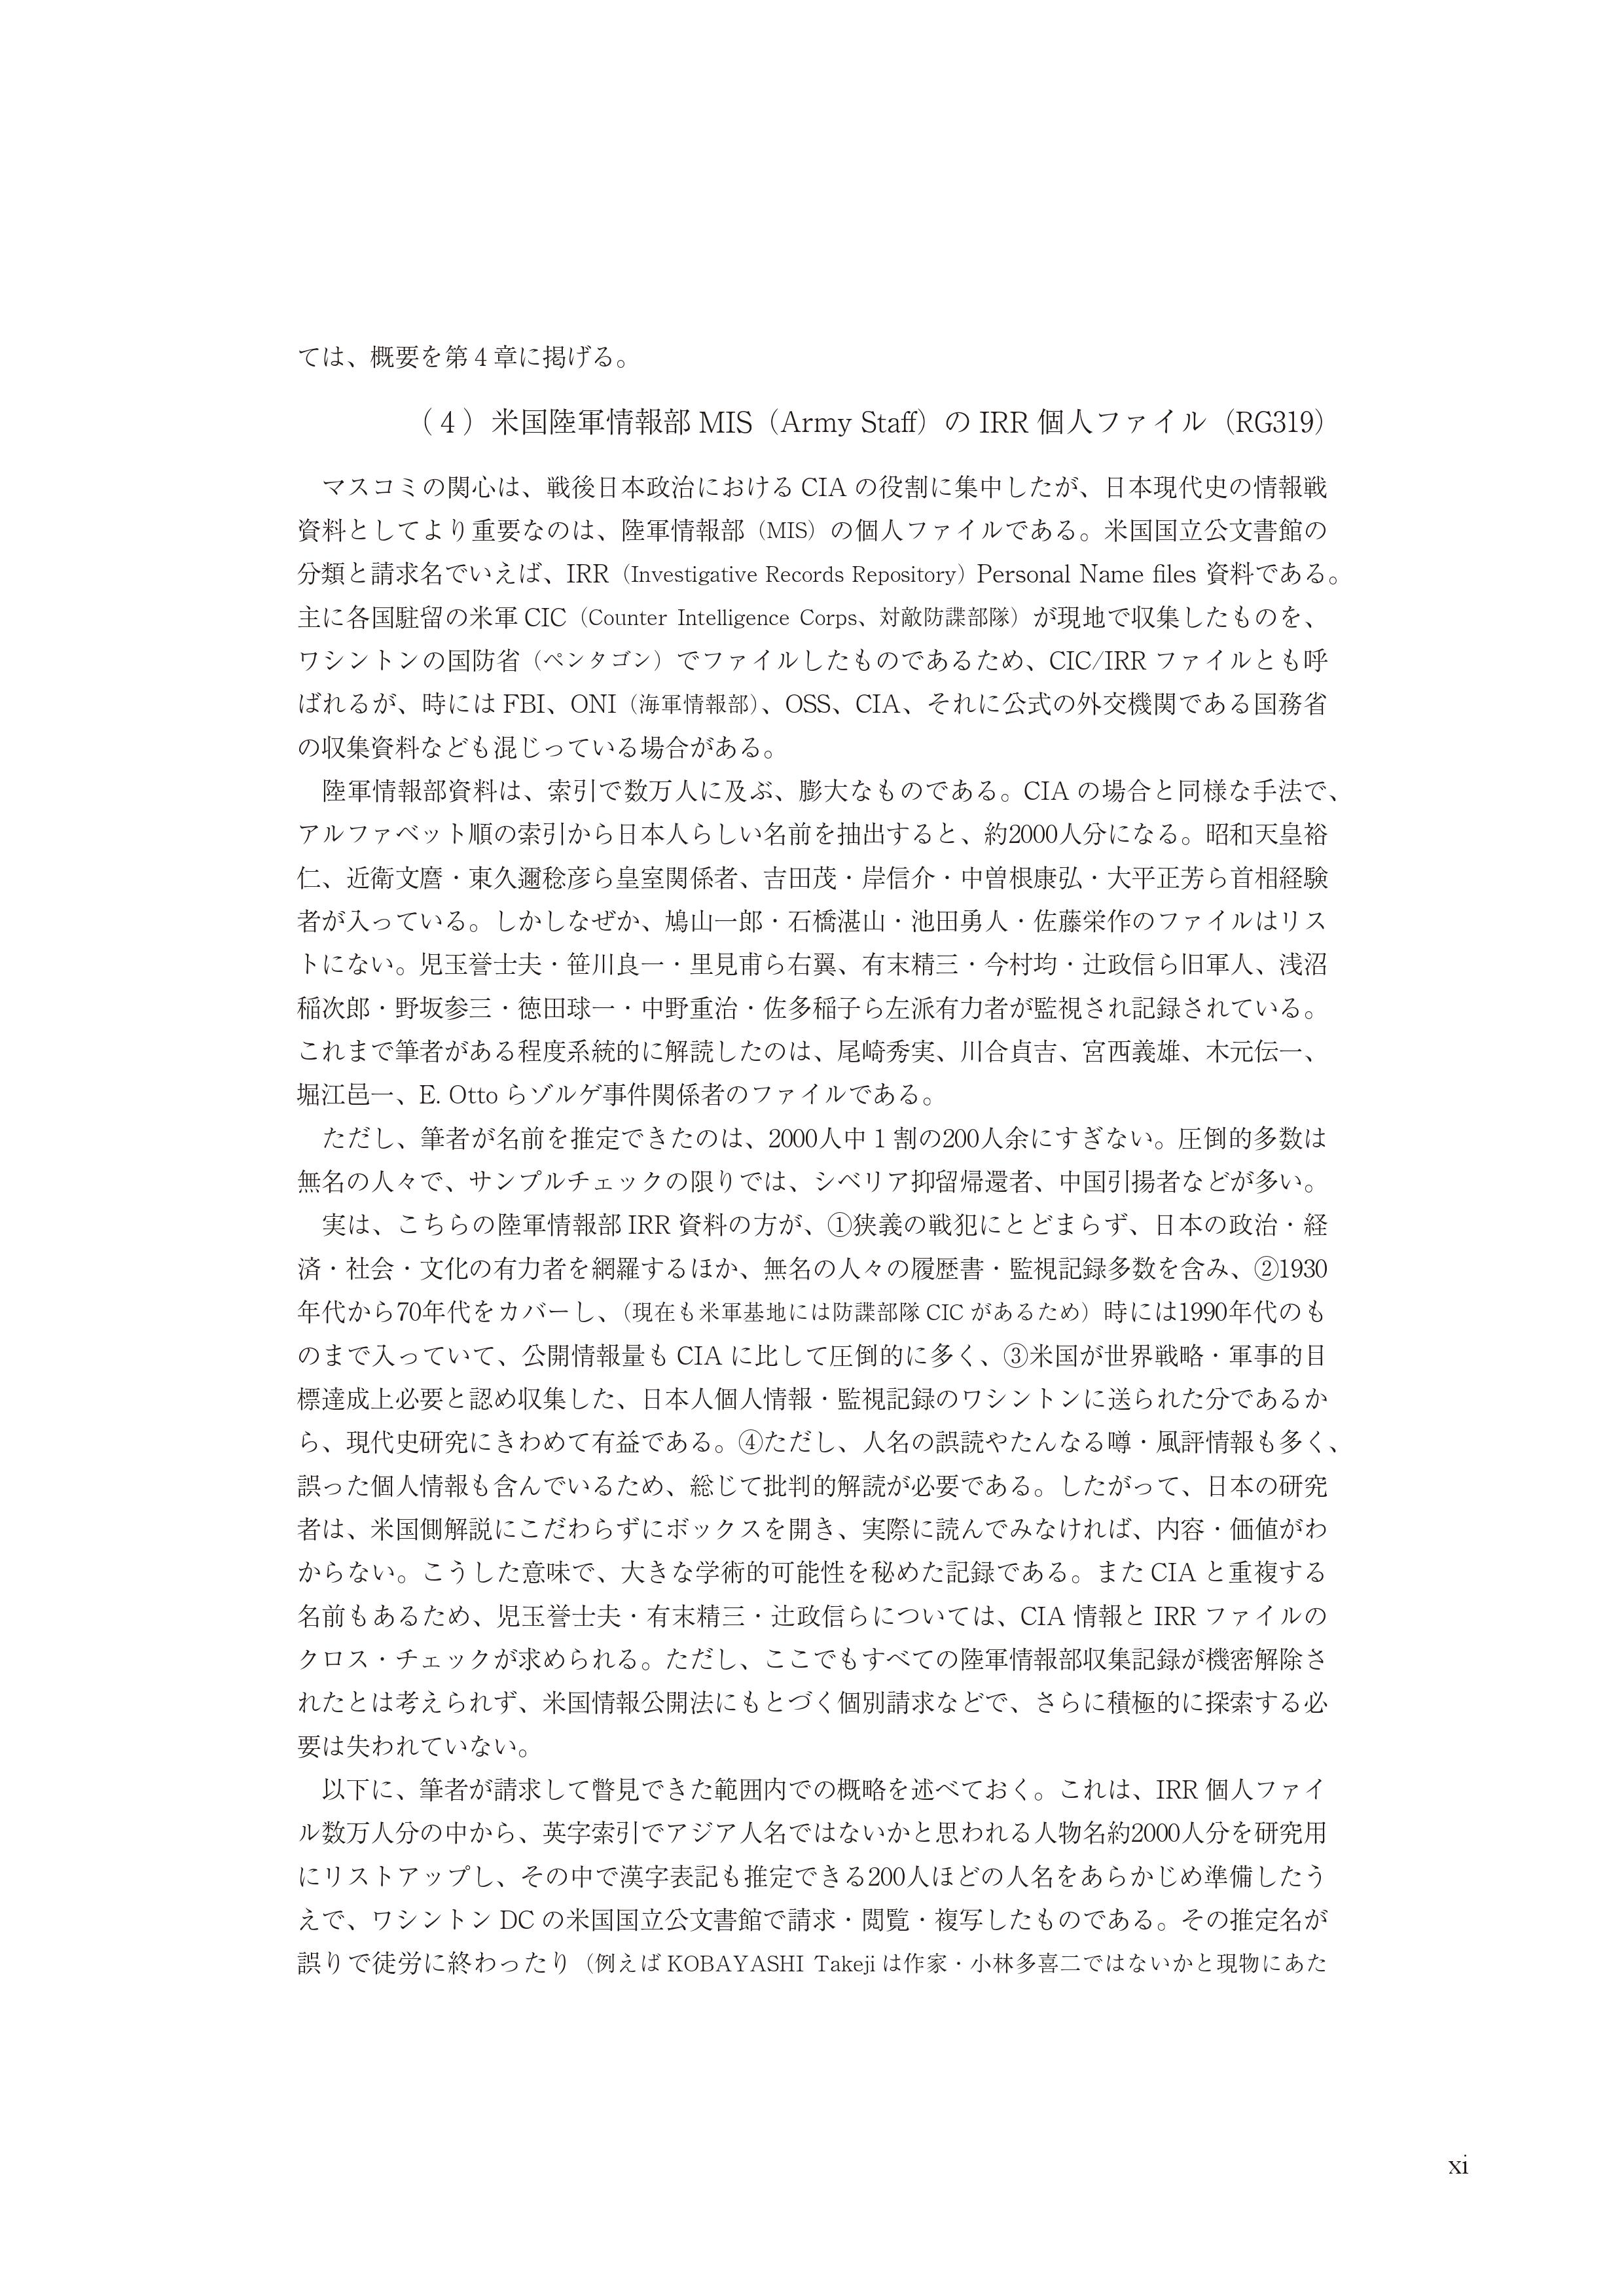 CIA日本人ファイル0001 (11)